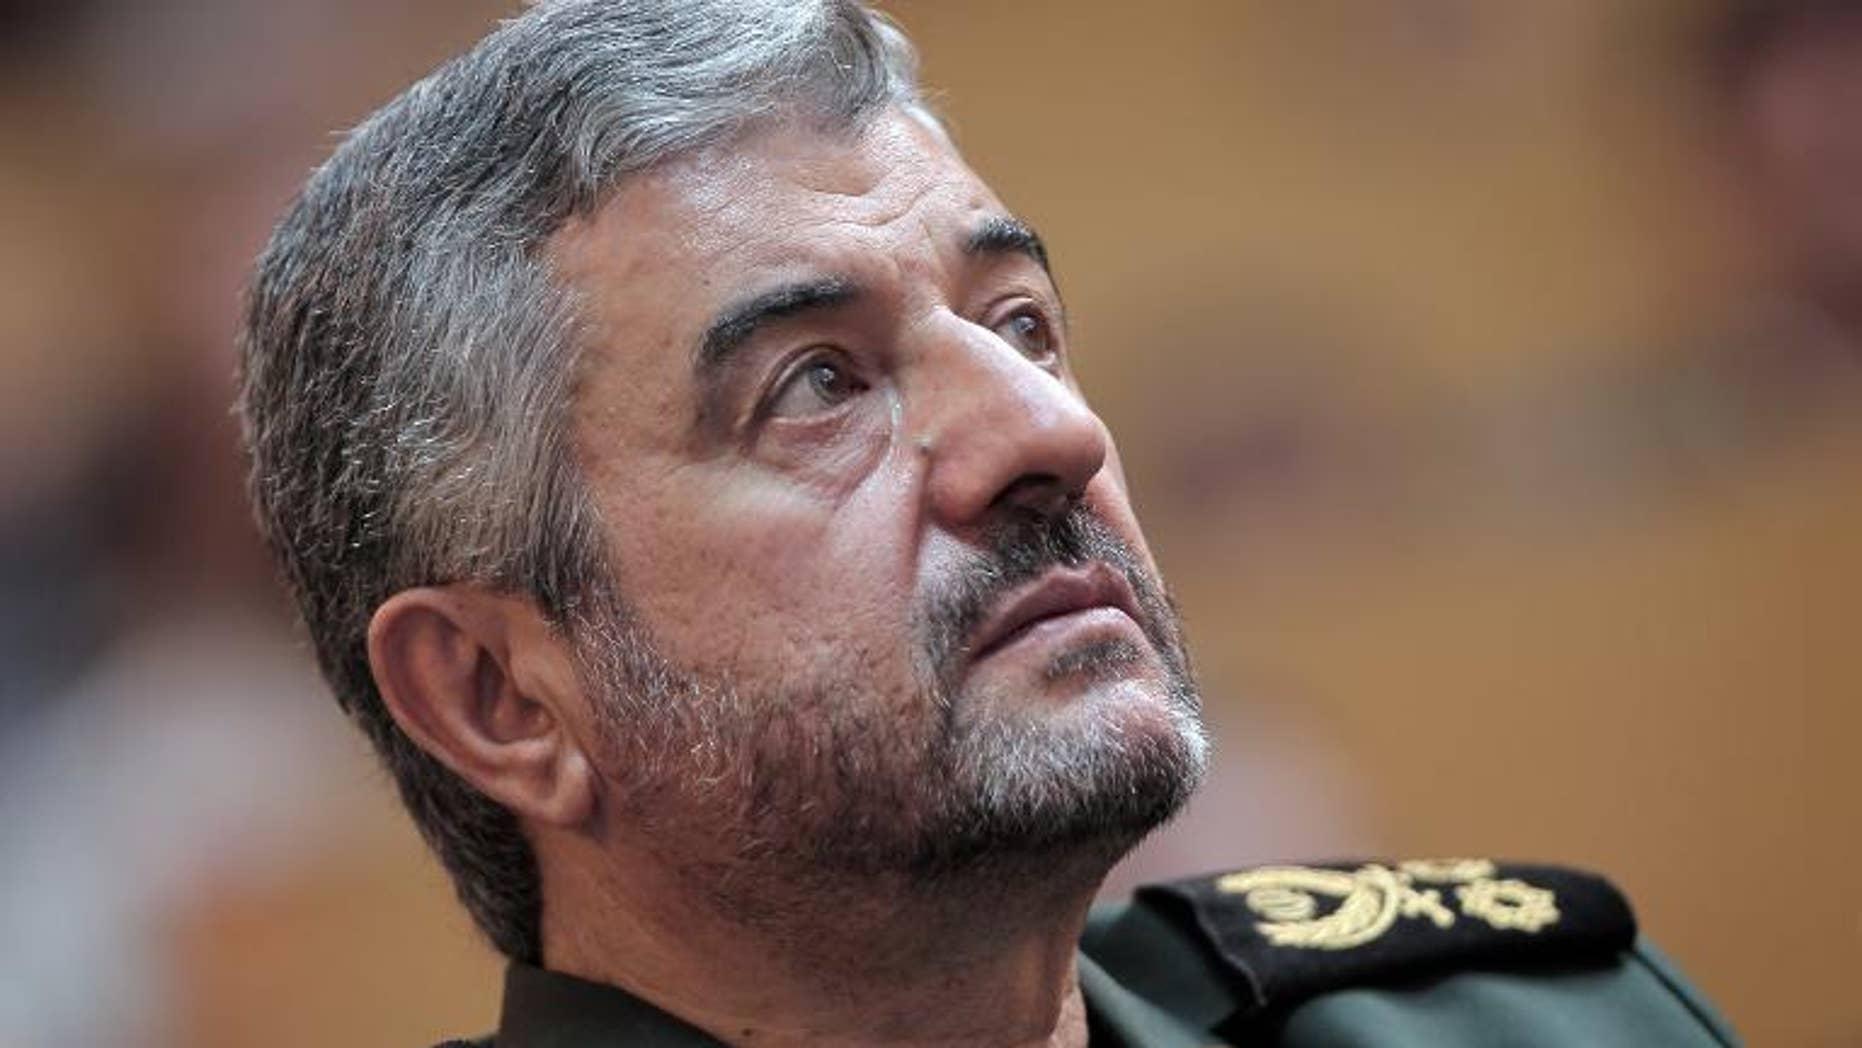 Iran's Revolutionary Guards commander General Mohammad Ali Jafari looks up during a ceremony in Tehran, on September 6, 2011